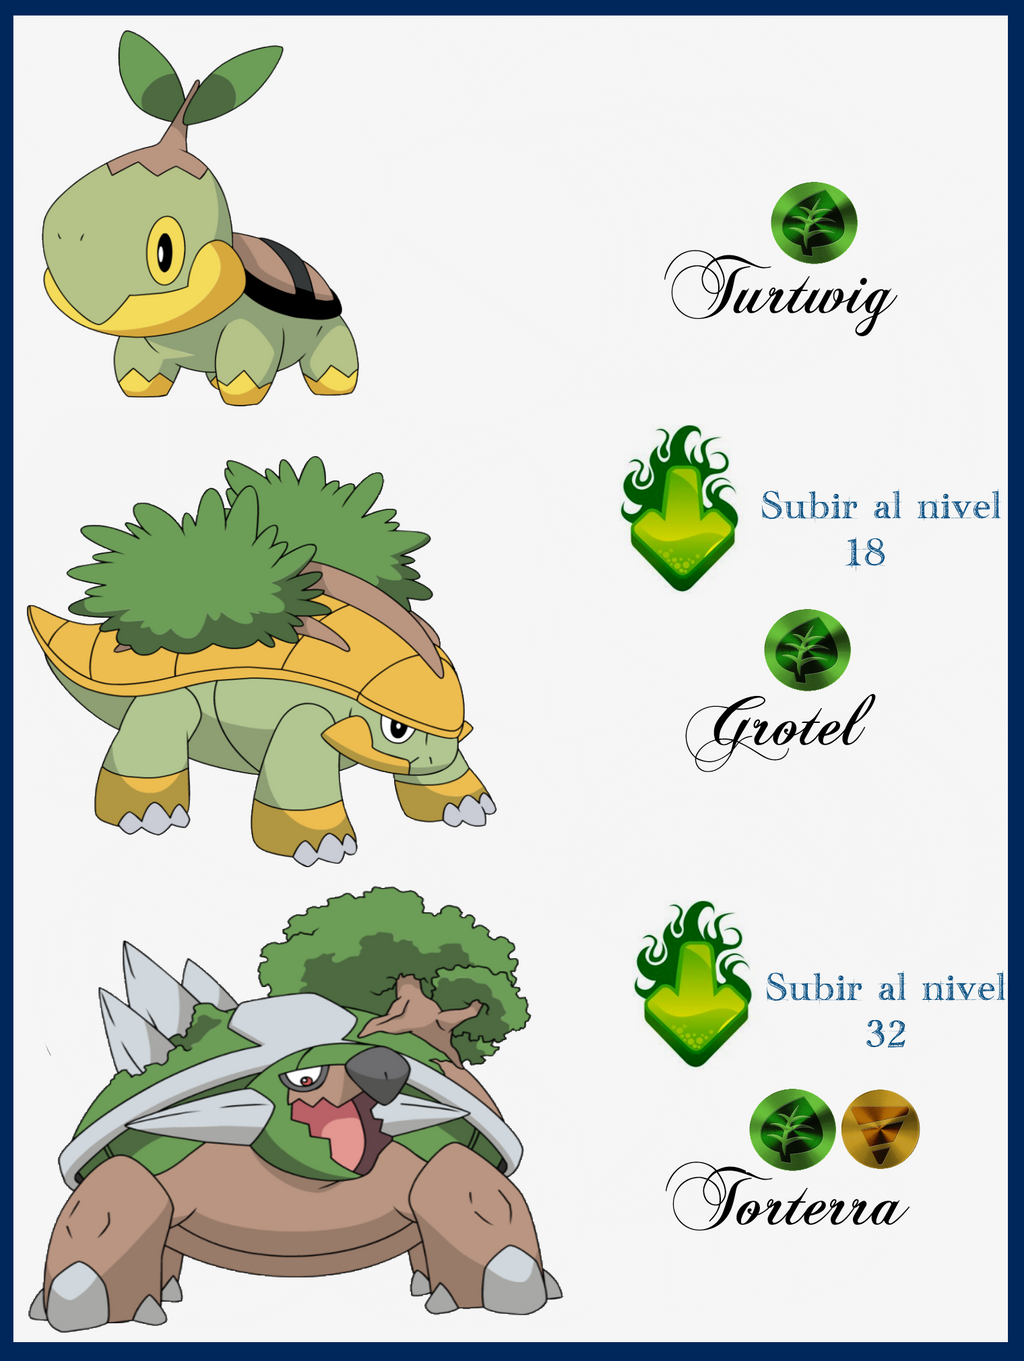 Pokemon Turtwig Evolution Chart Images | Pokemon Images